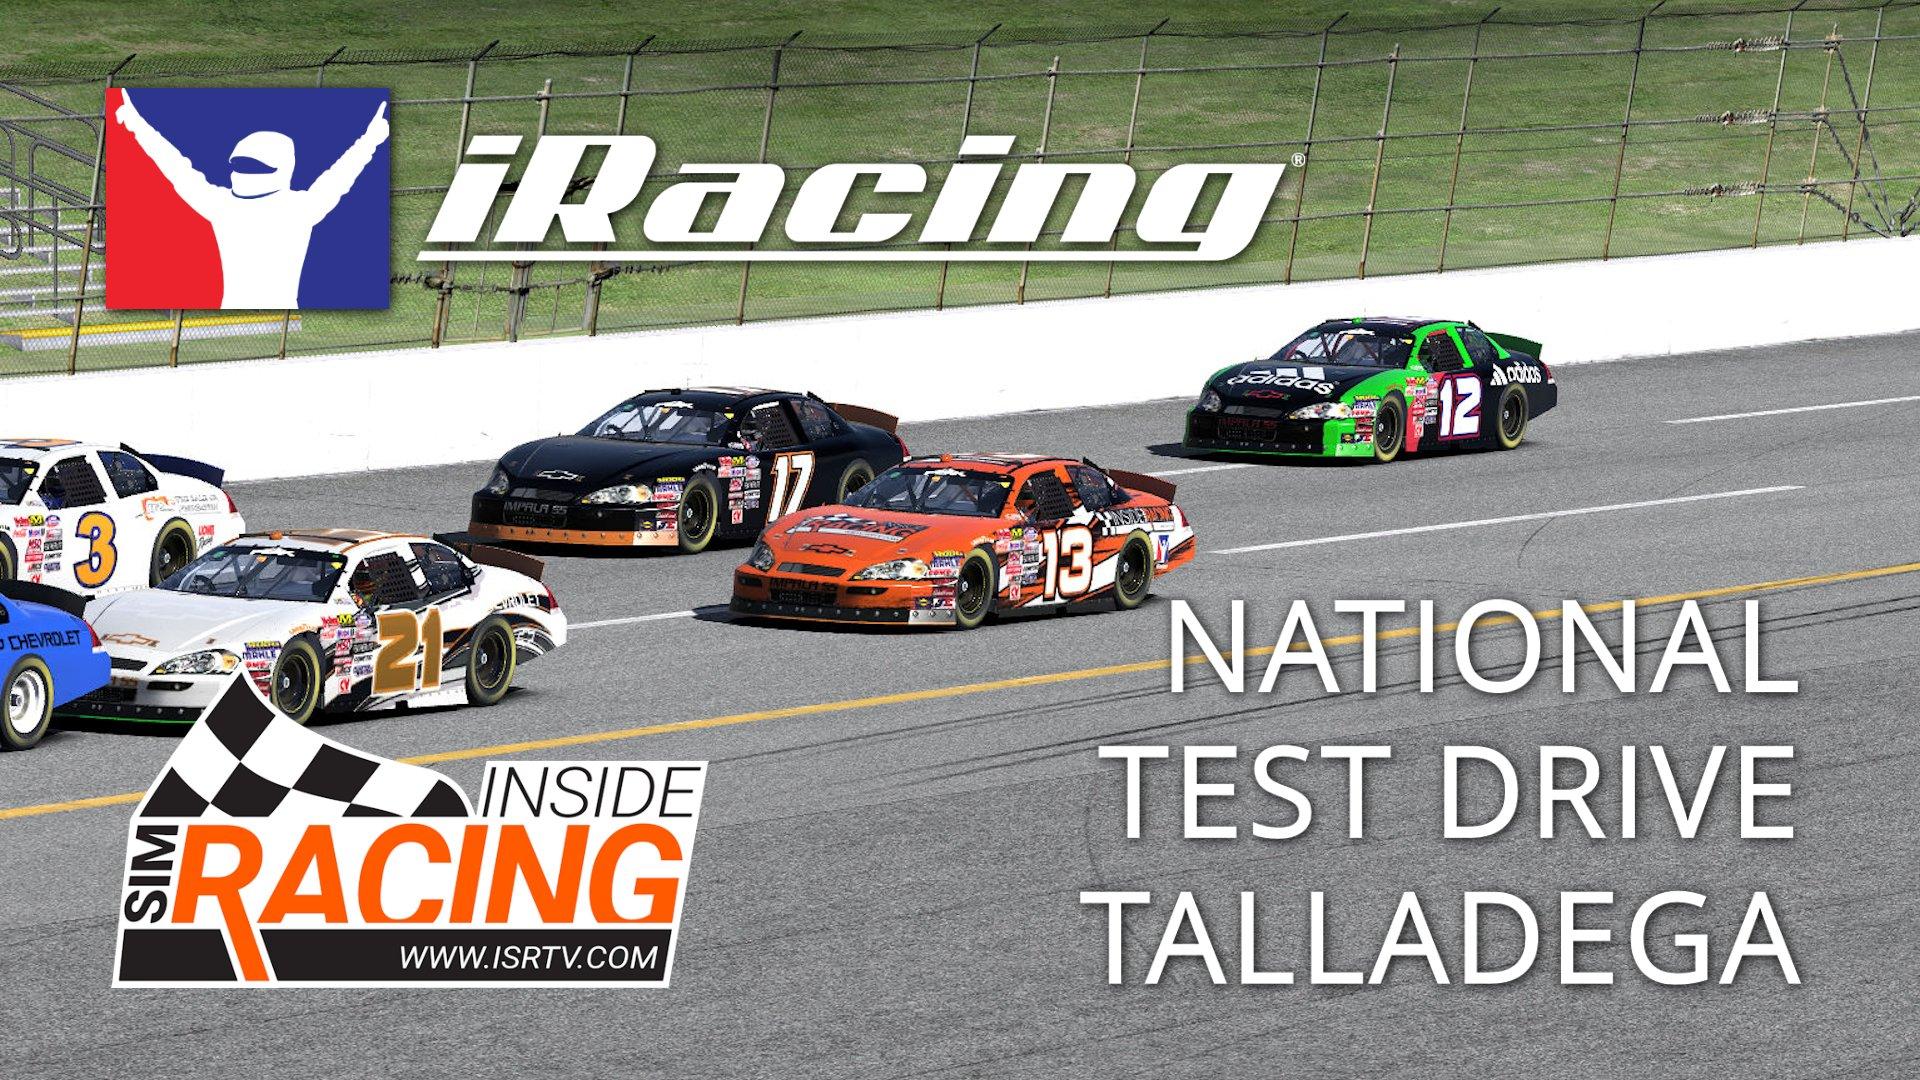 iRacing National Series Test Drive at Talladega - Inside Sim